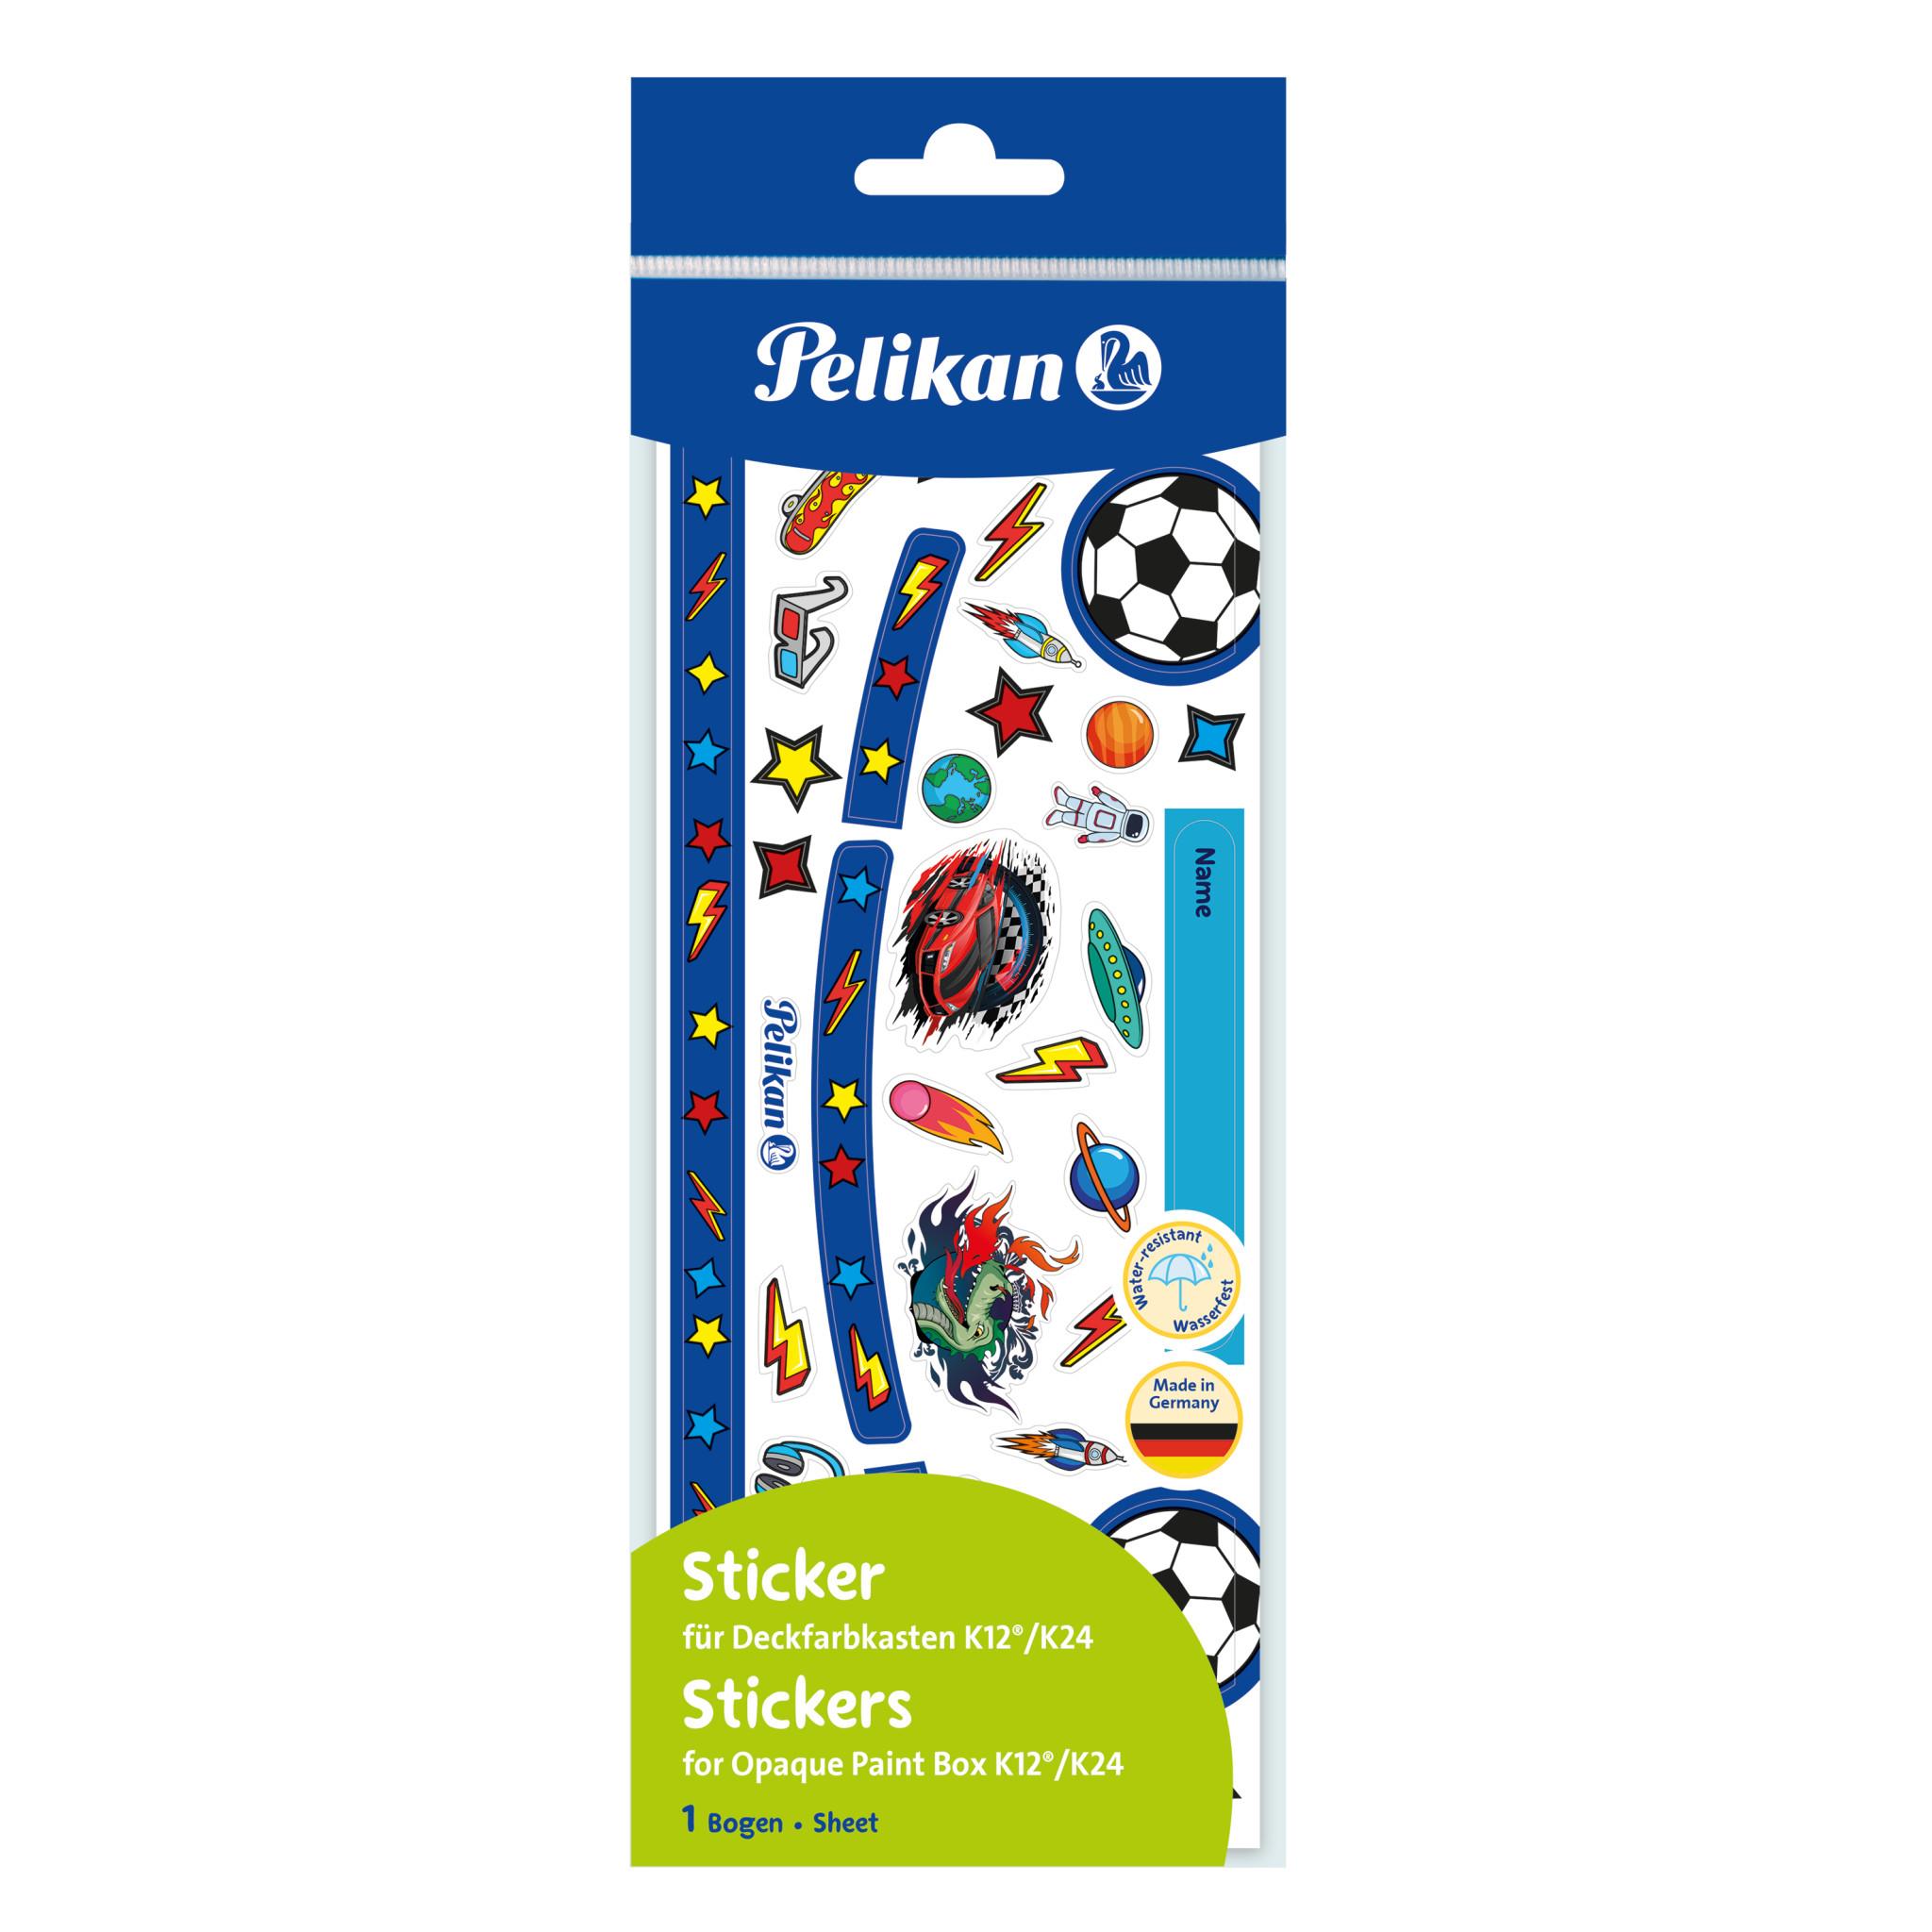 Pelikan Sticker für K12/K24 Deckfarbkasten Blau/Fussball